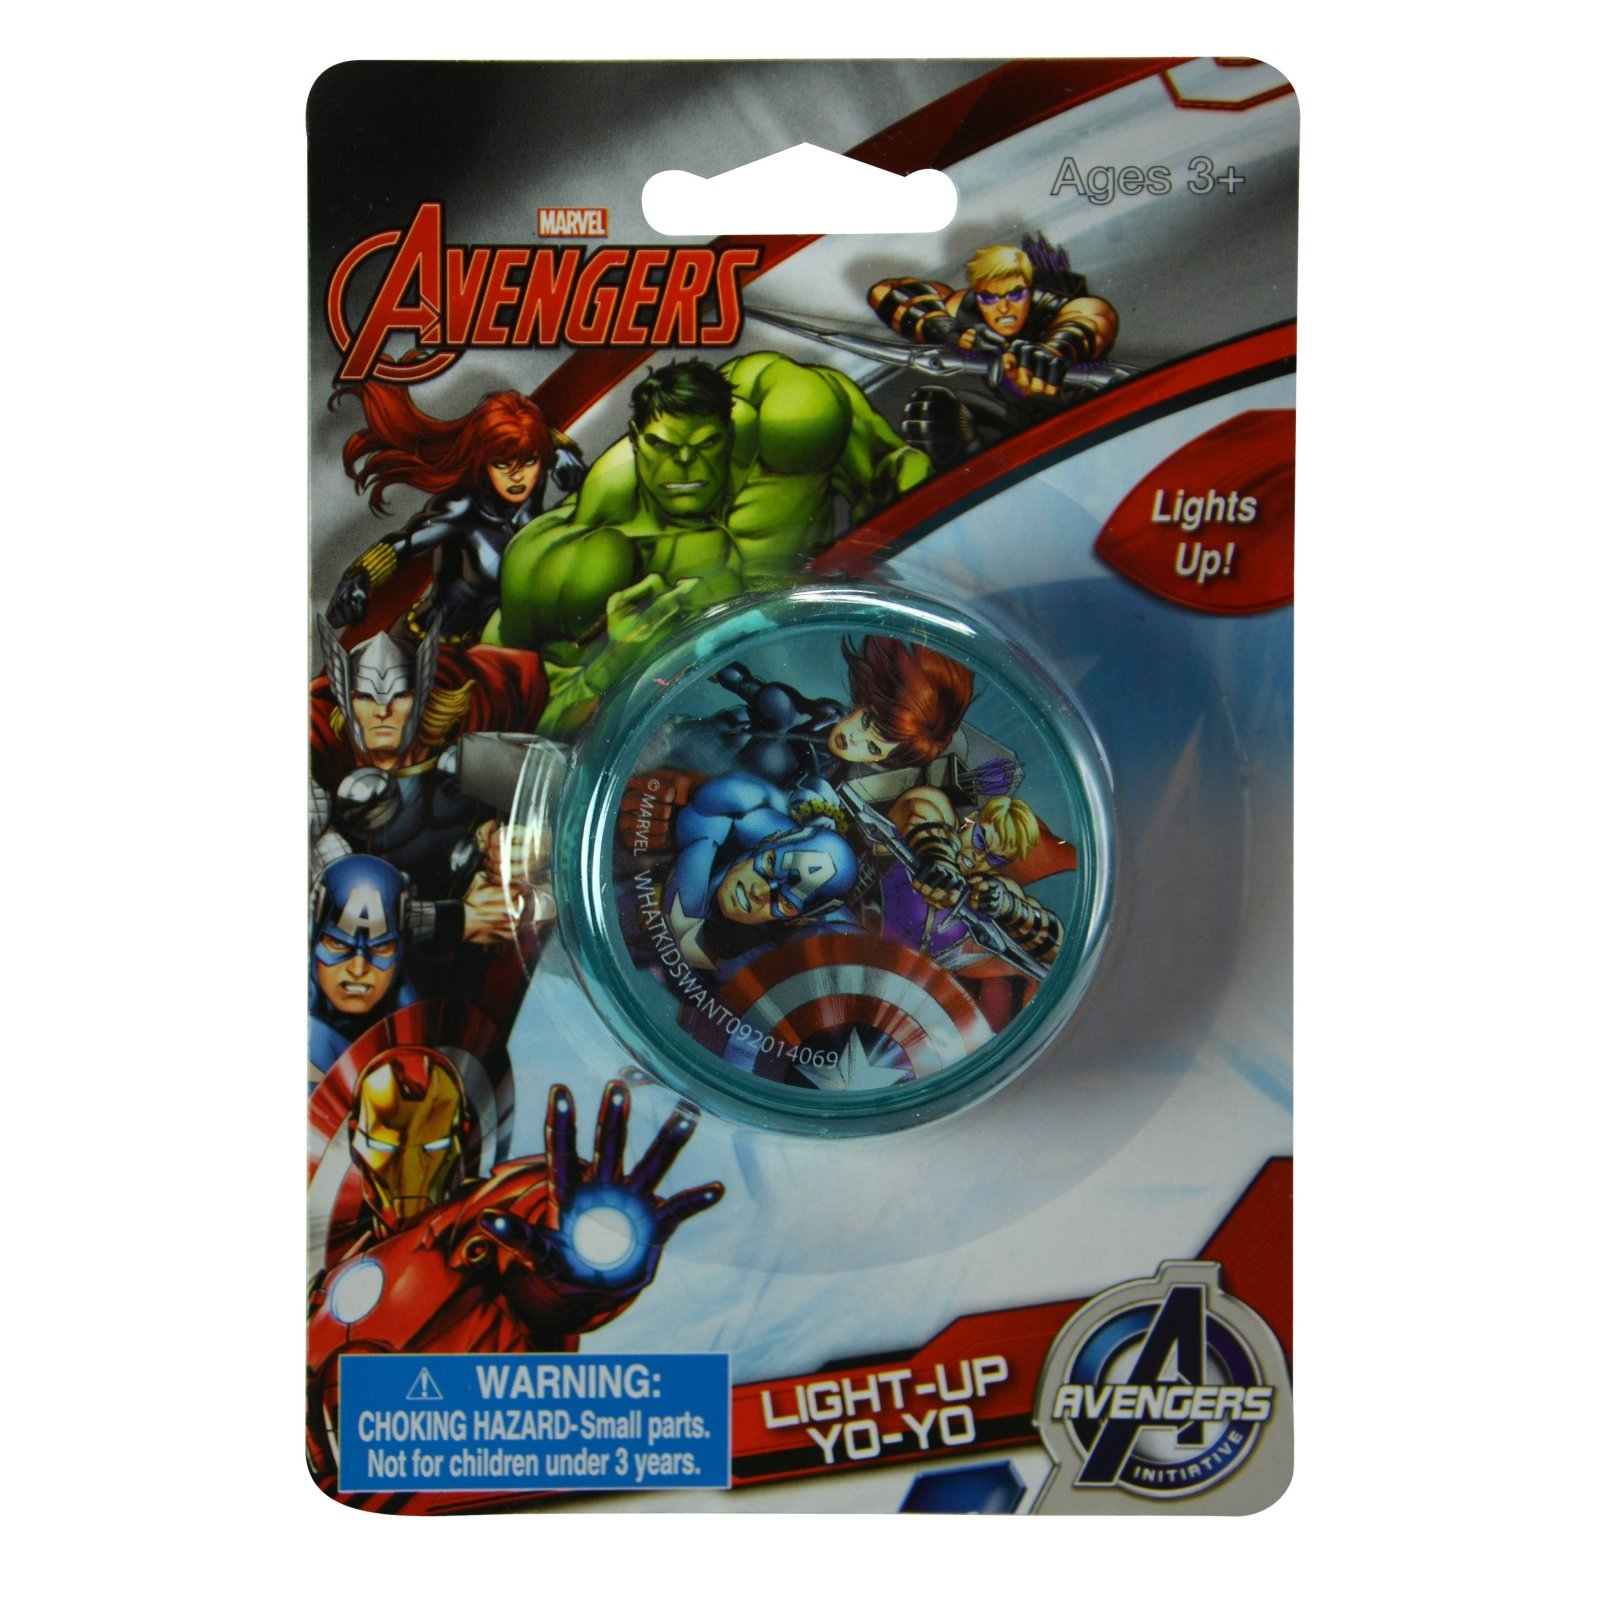 Kids Marvel Avengers Light Up LED Yo Yo Toy With Captain America and Thor